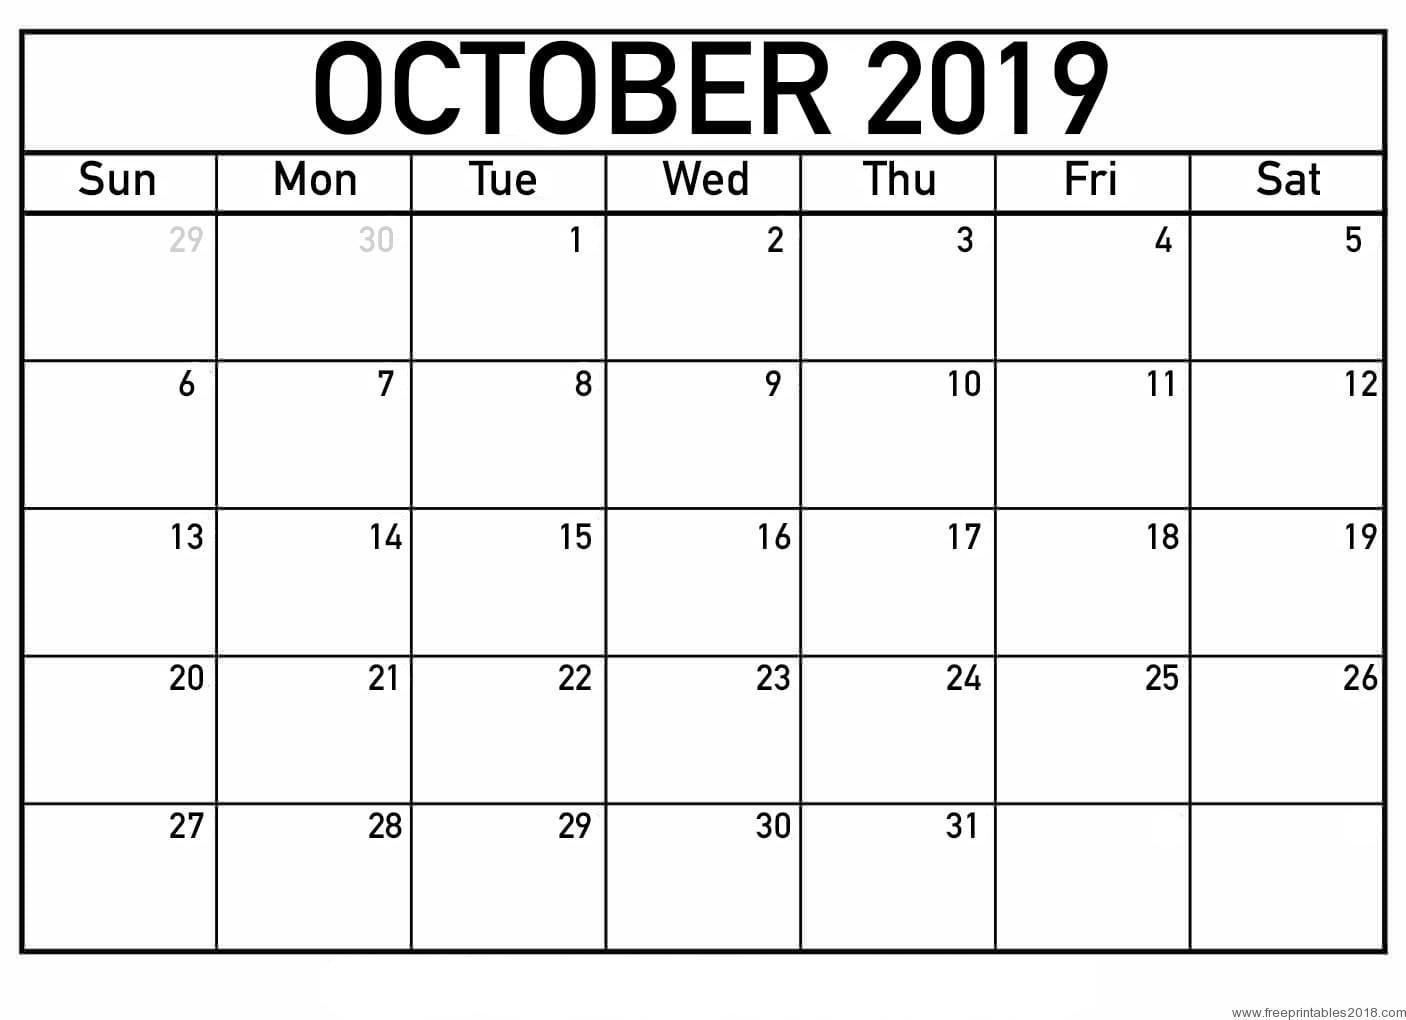 Calendar October 2019 - Free Printable Templates | Free Printables 2019 throughout Calendar 2019 October To December